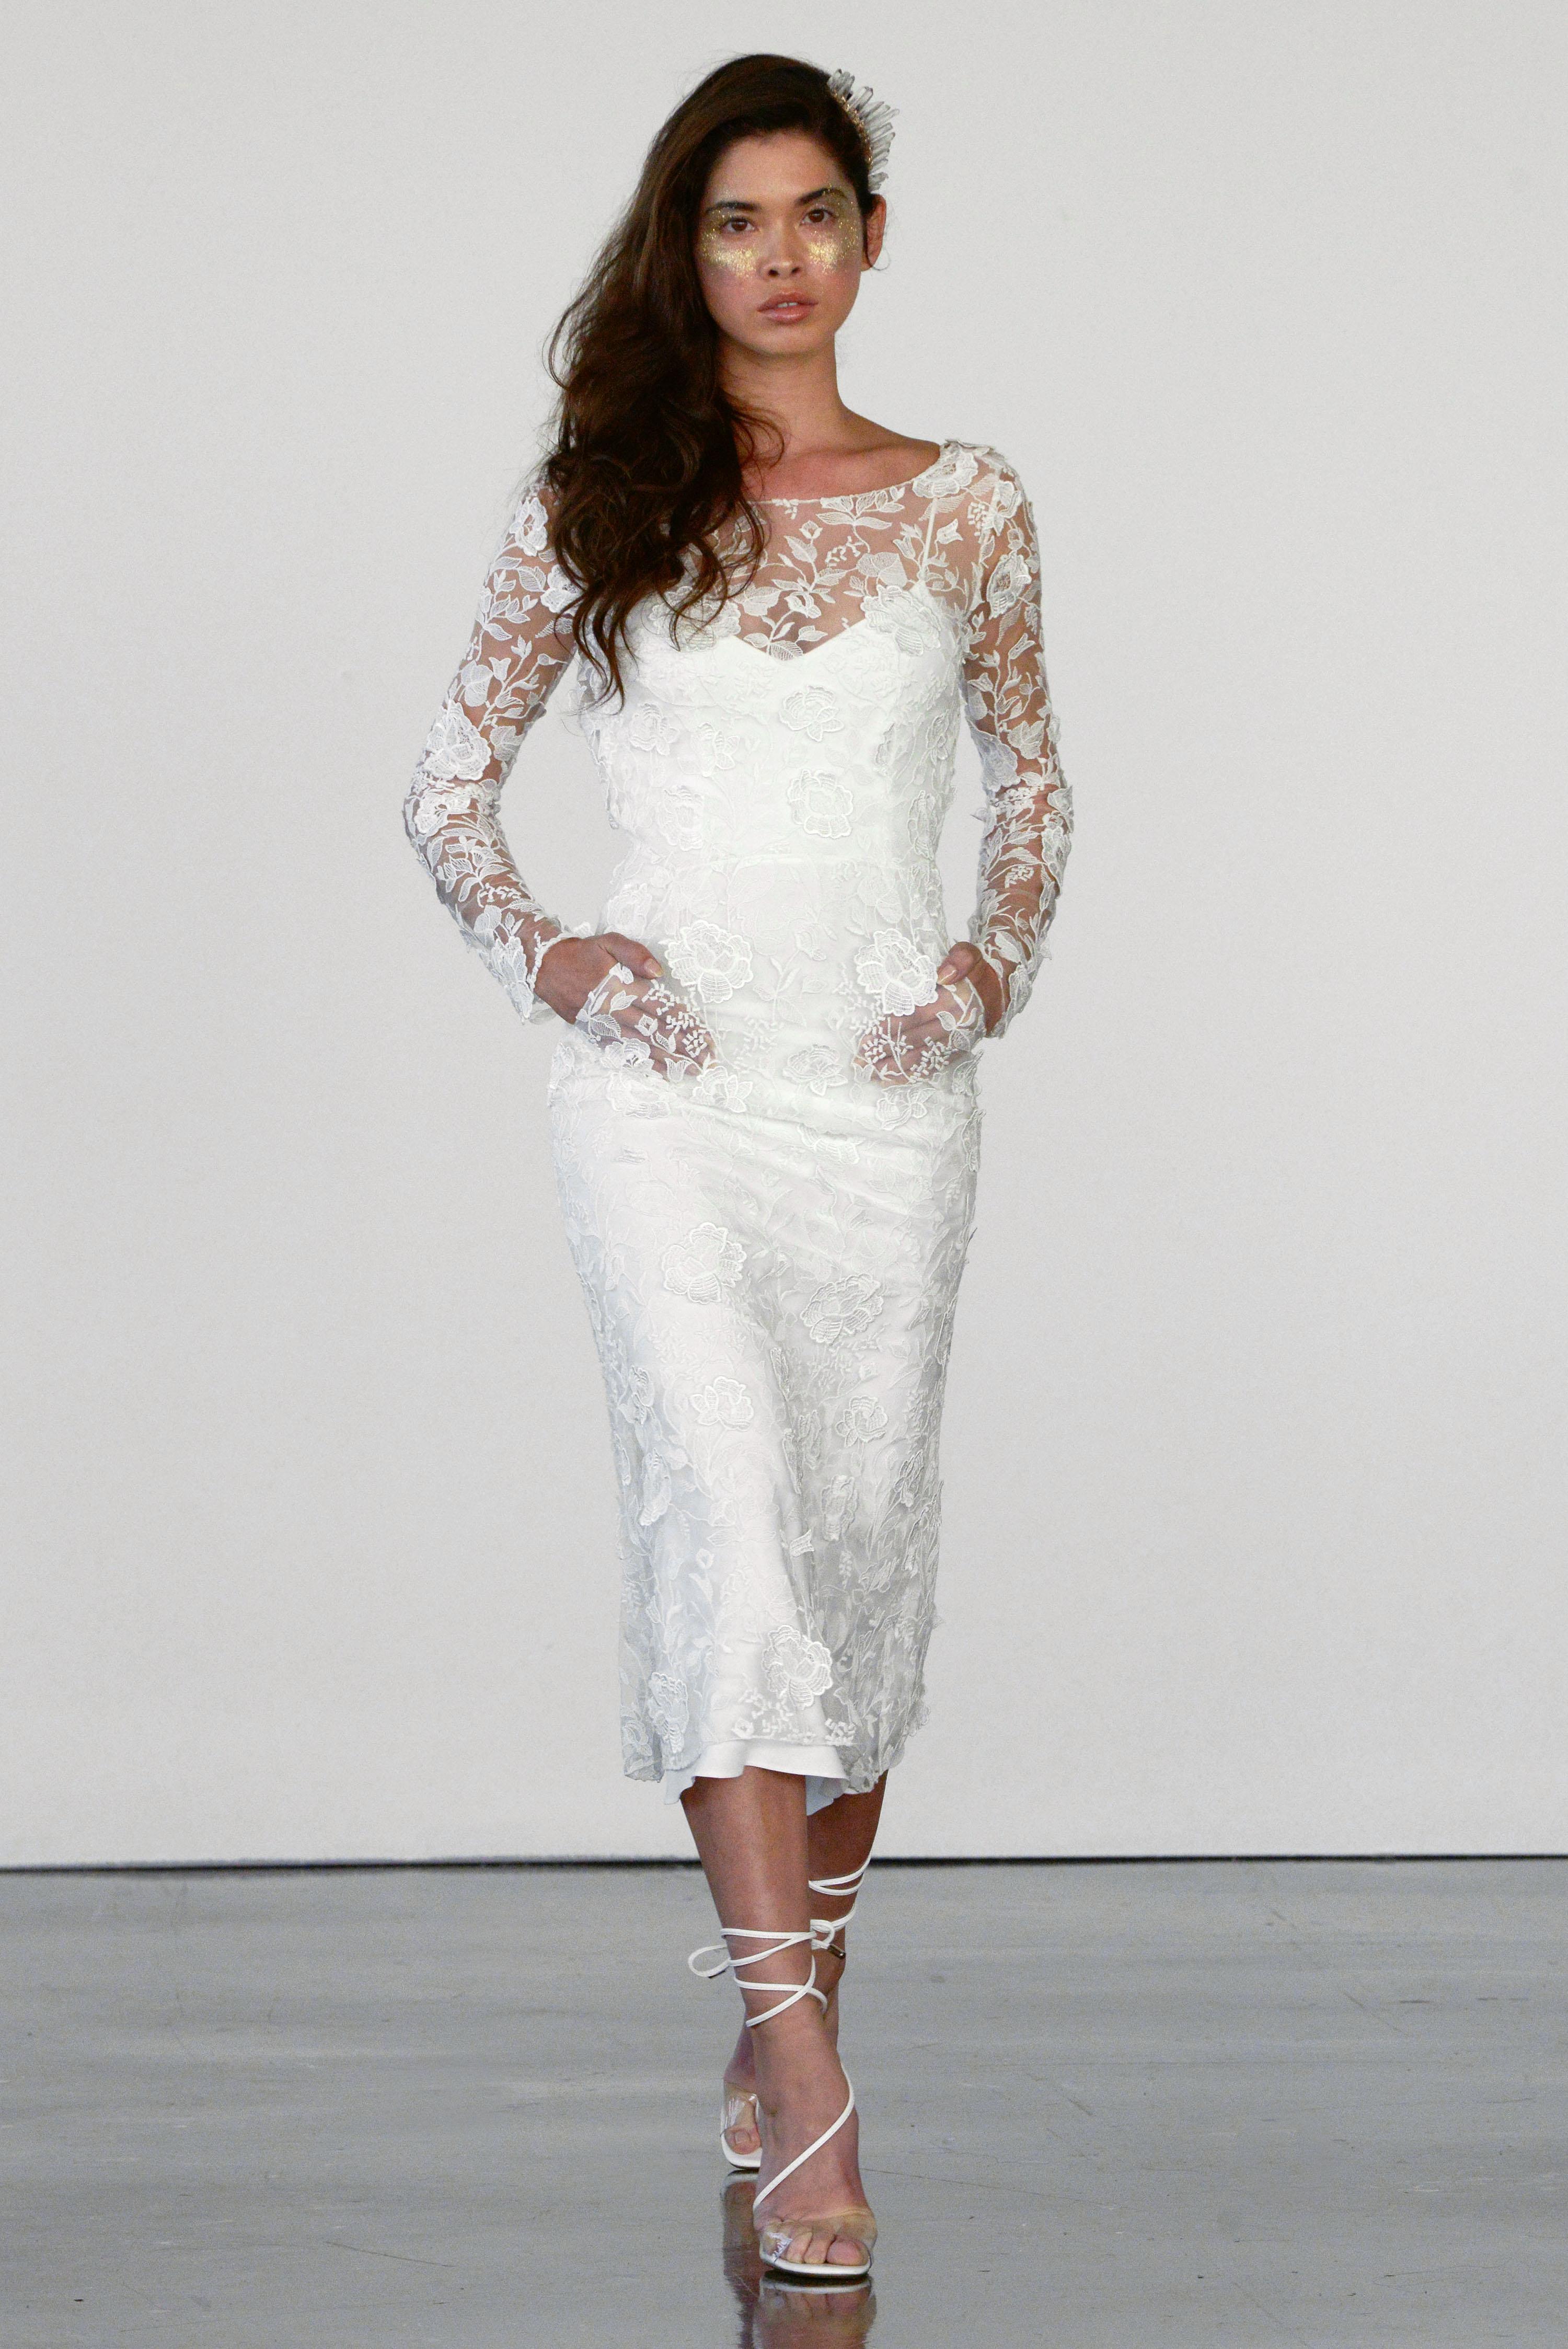 Rime Arodaky wedding dress - 9 Fall 2017